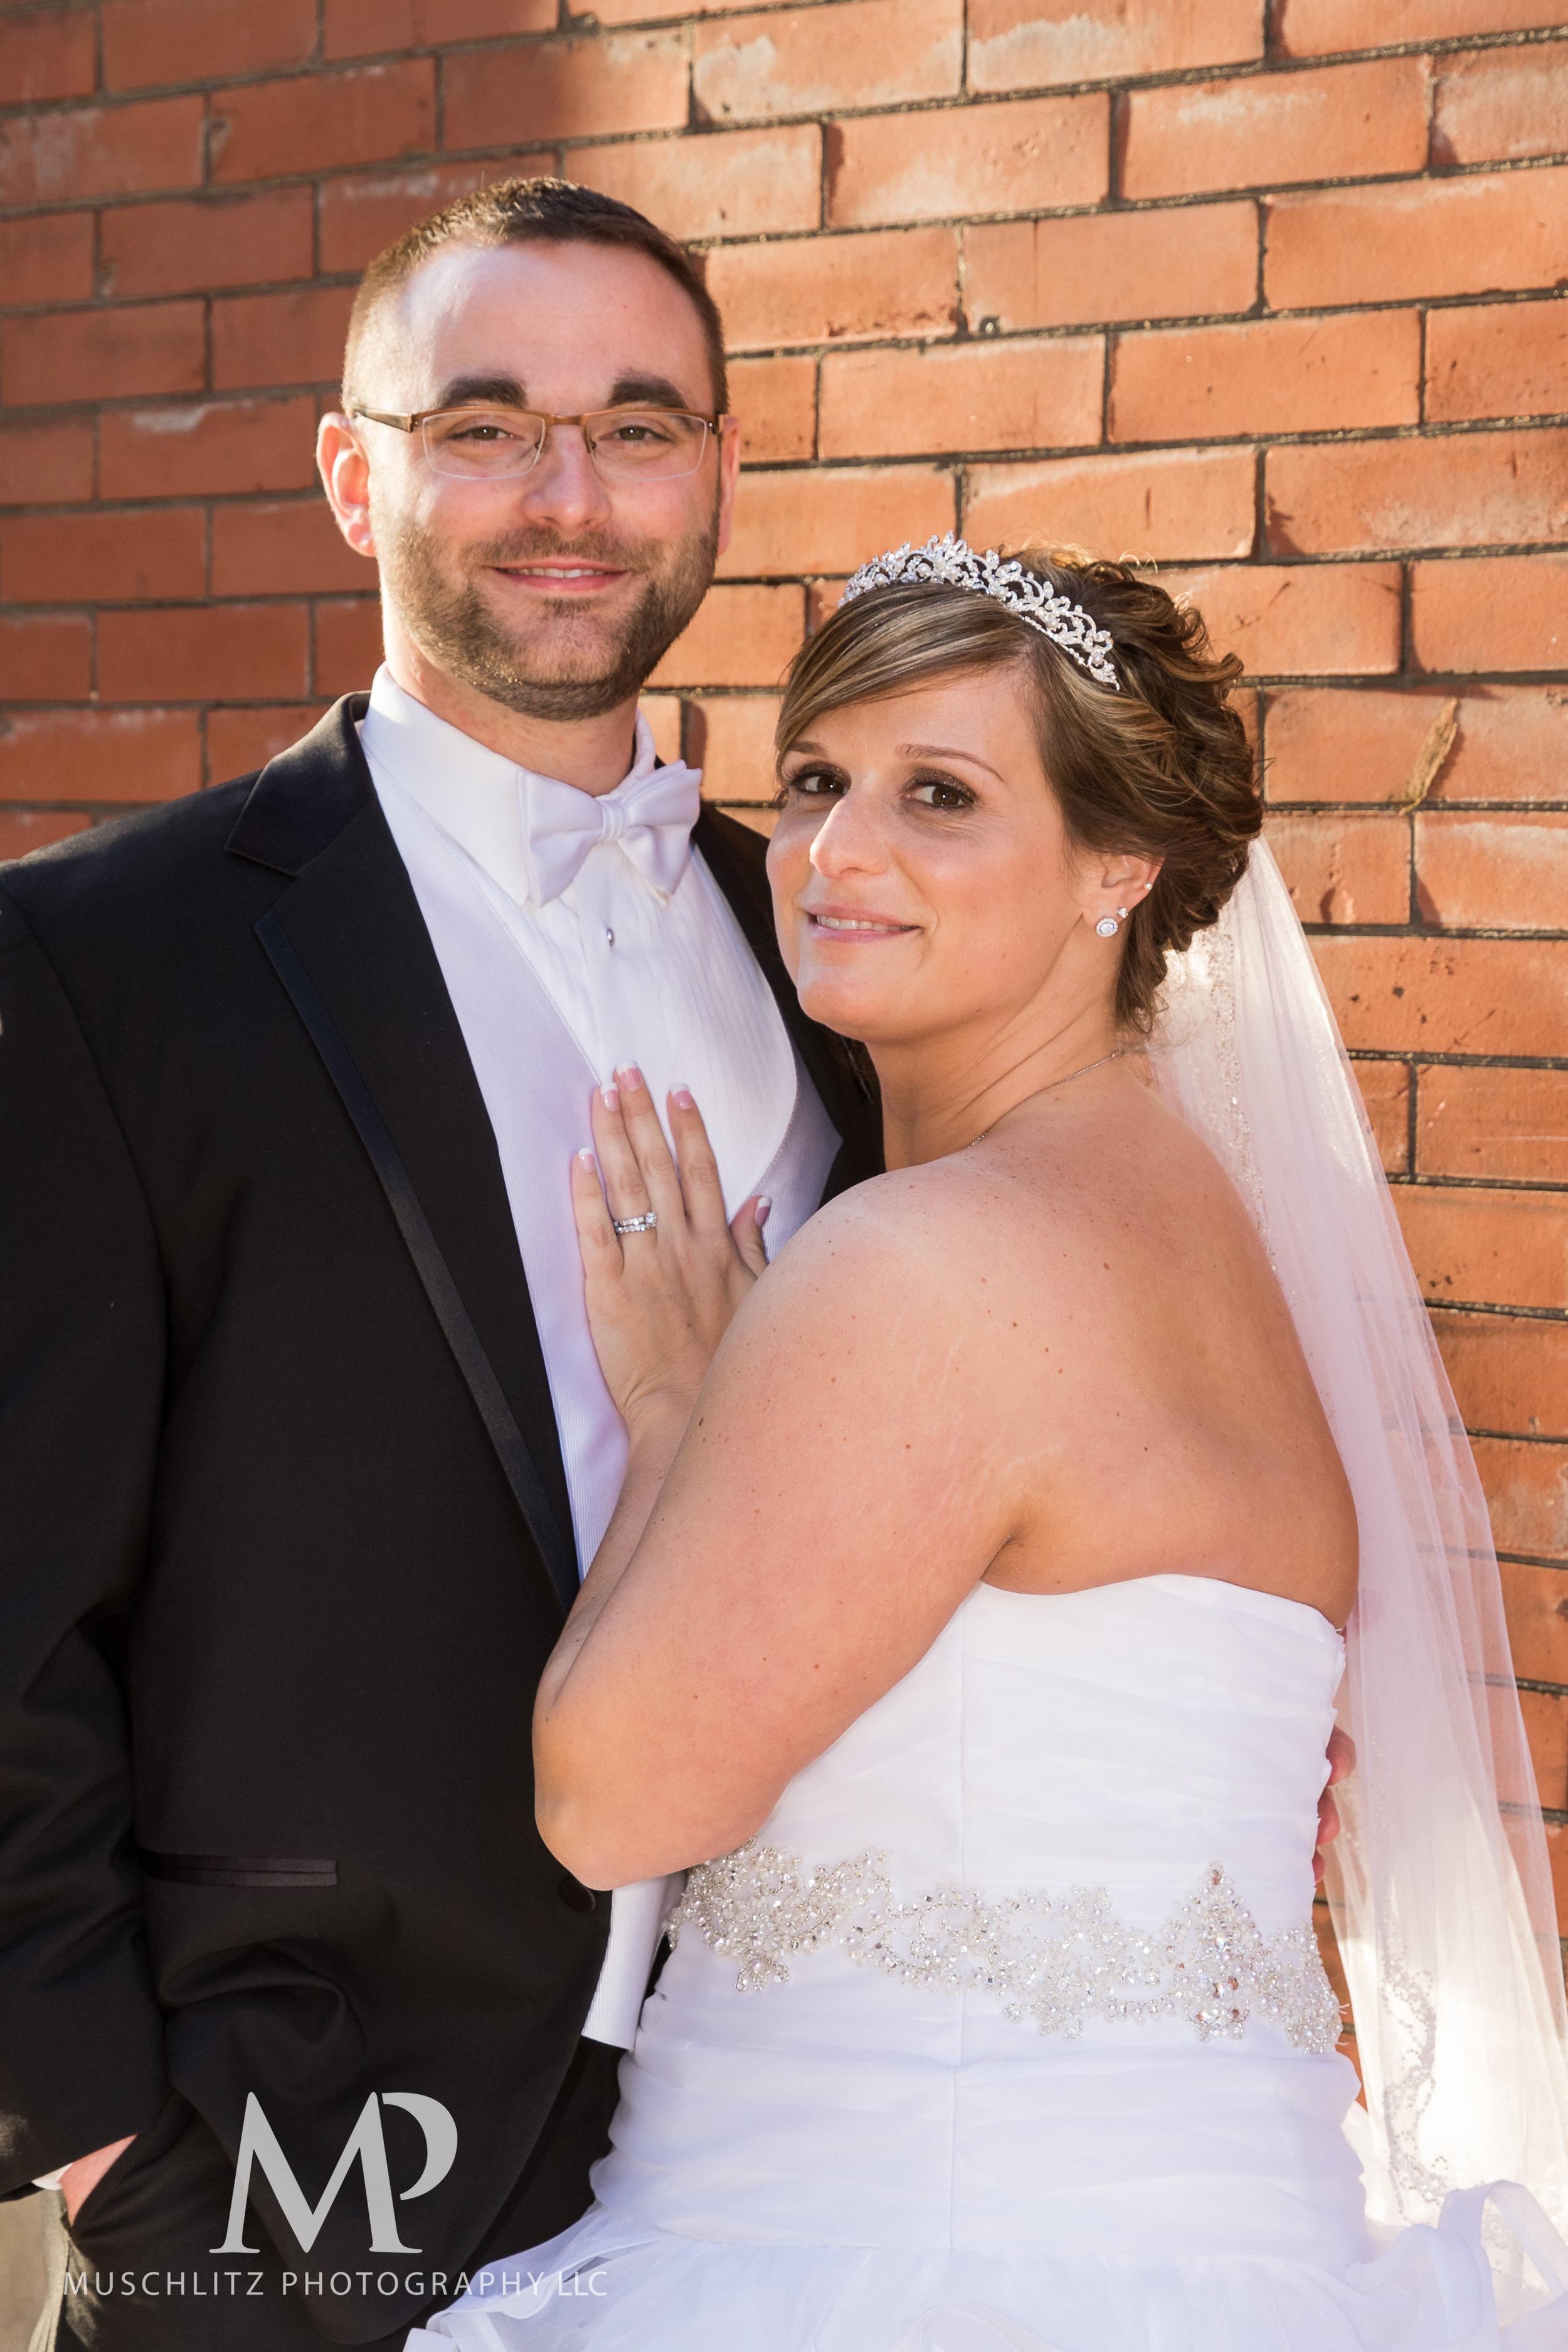 the hilton-columbus-wedding-portraits-downtown-columbus-ohio-muschlitz-photography-021.JPG